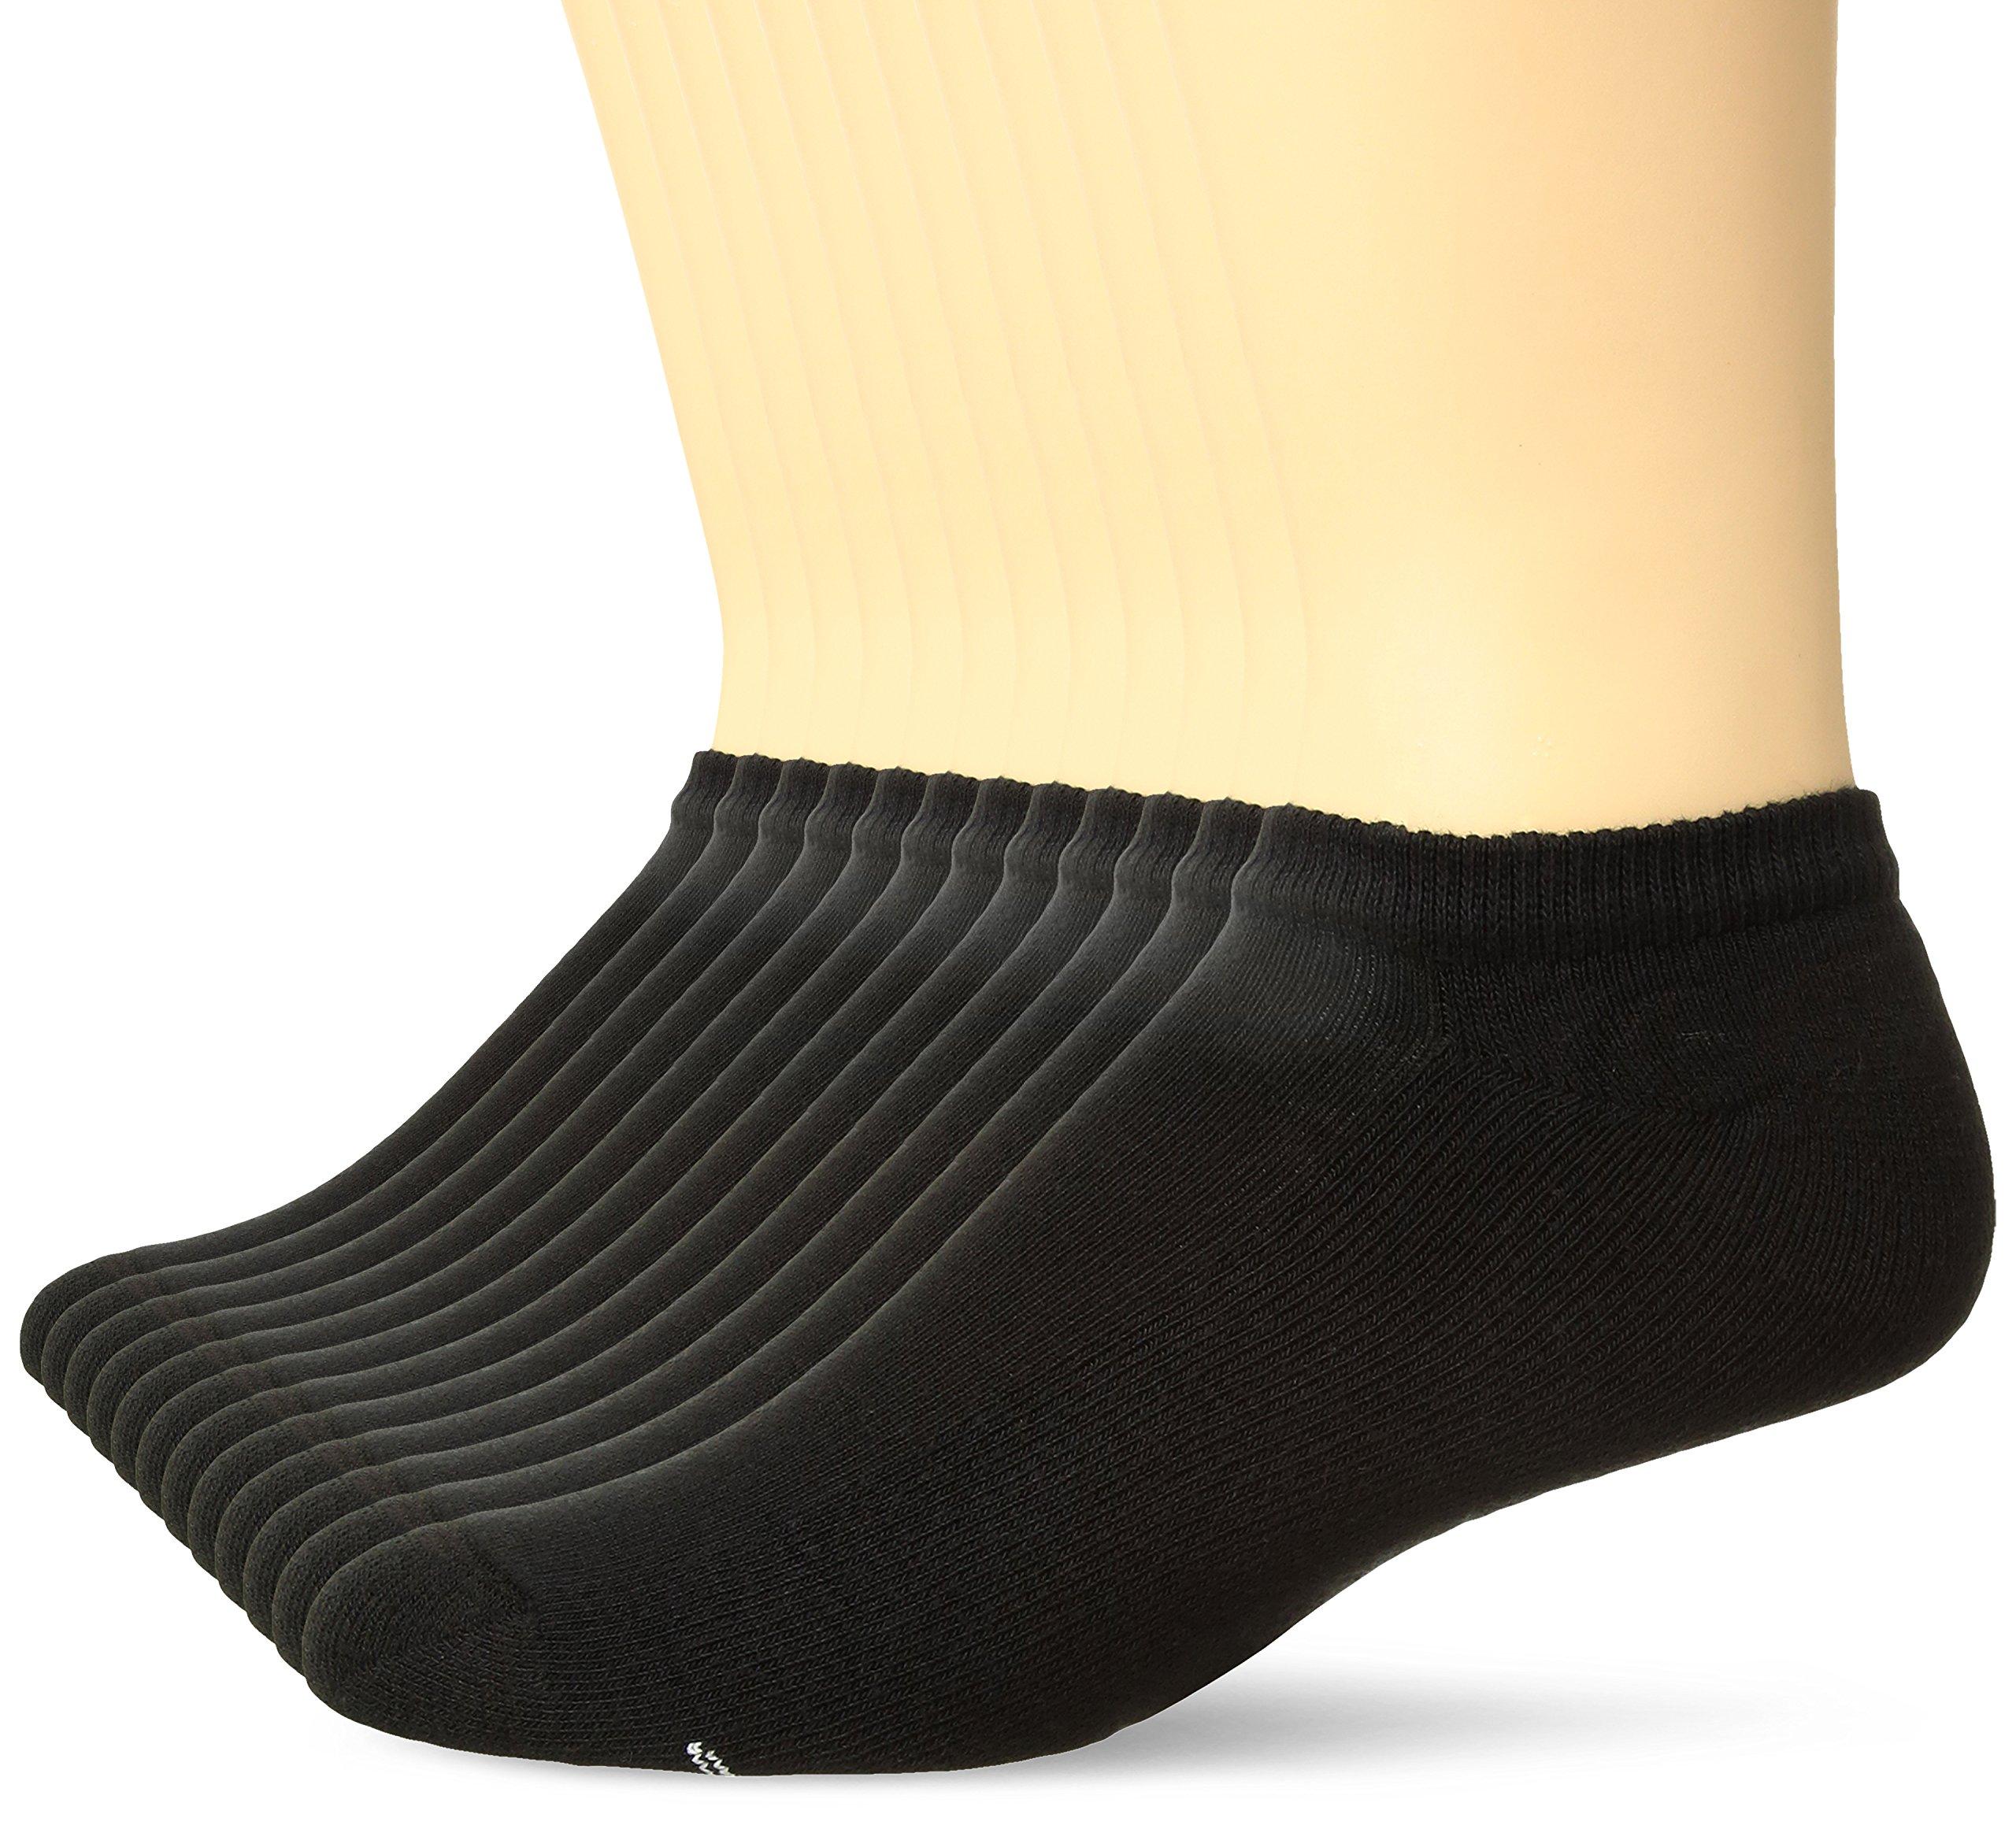 Hanes Men's Active Cool 12-Pack No Show Socks, Black, 6-12 US Shoe Size/10-13 US Sock Size